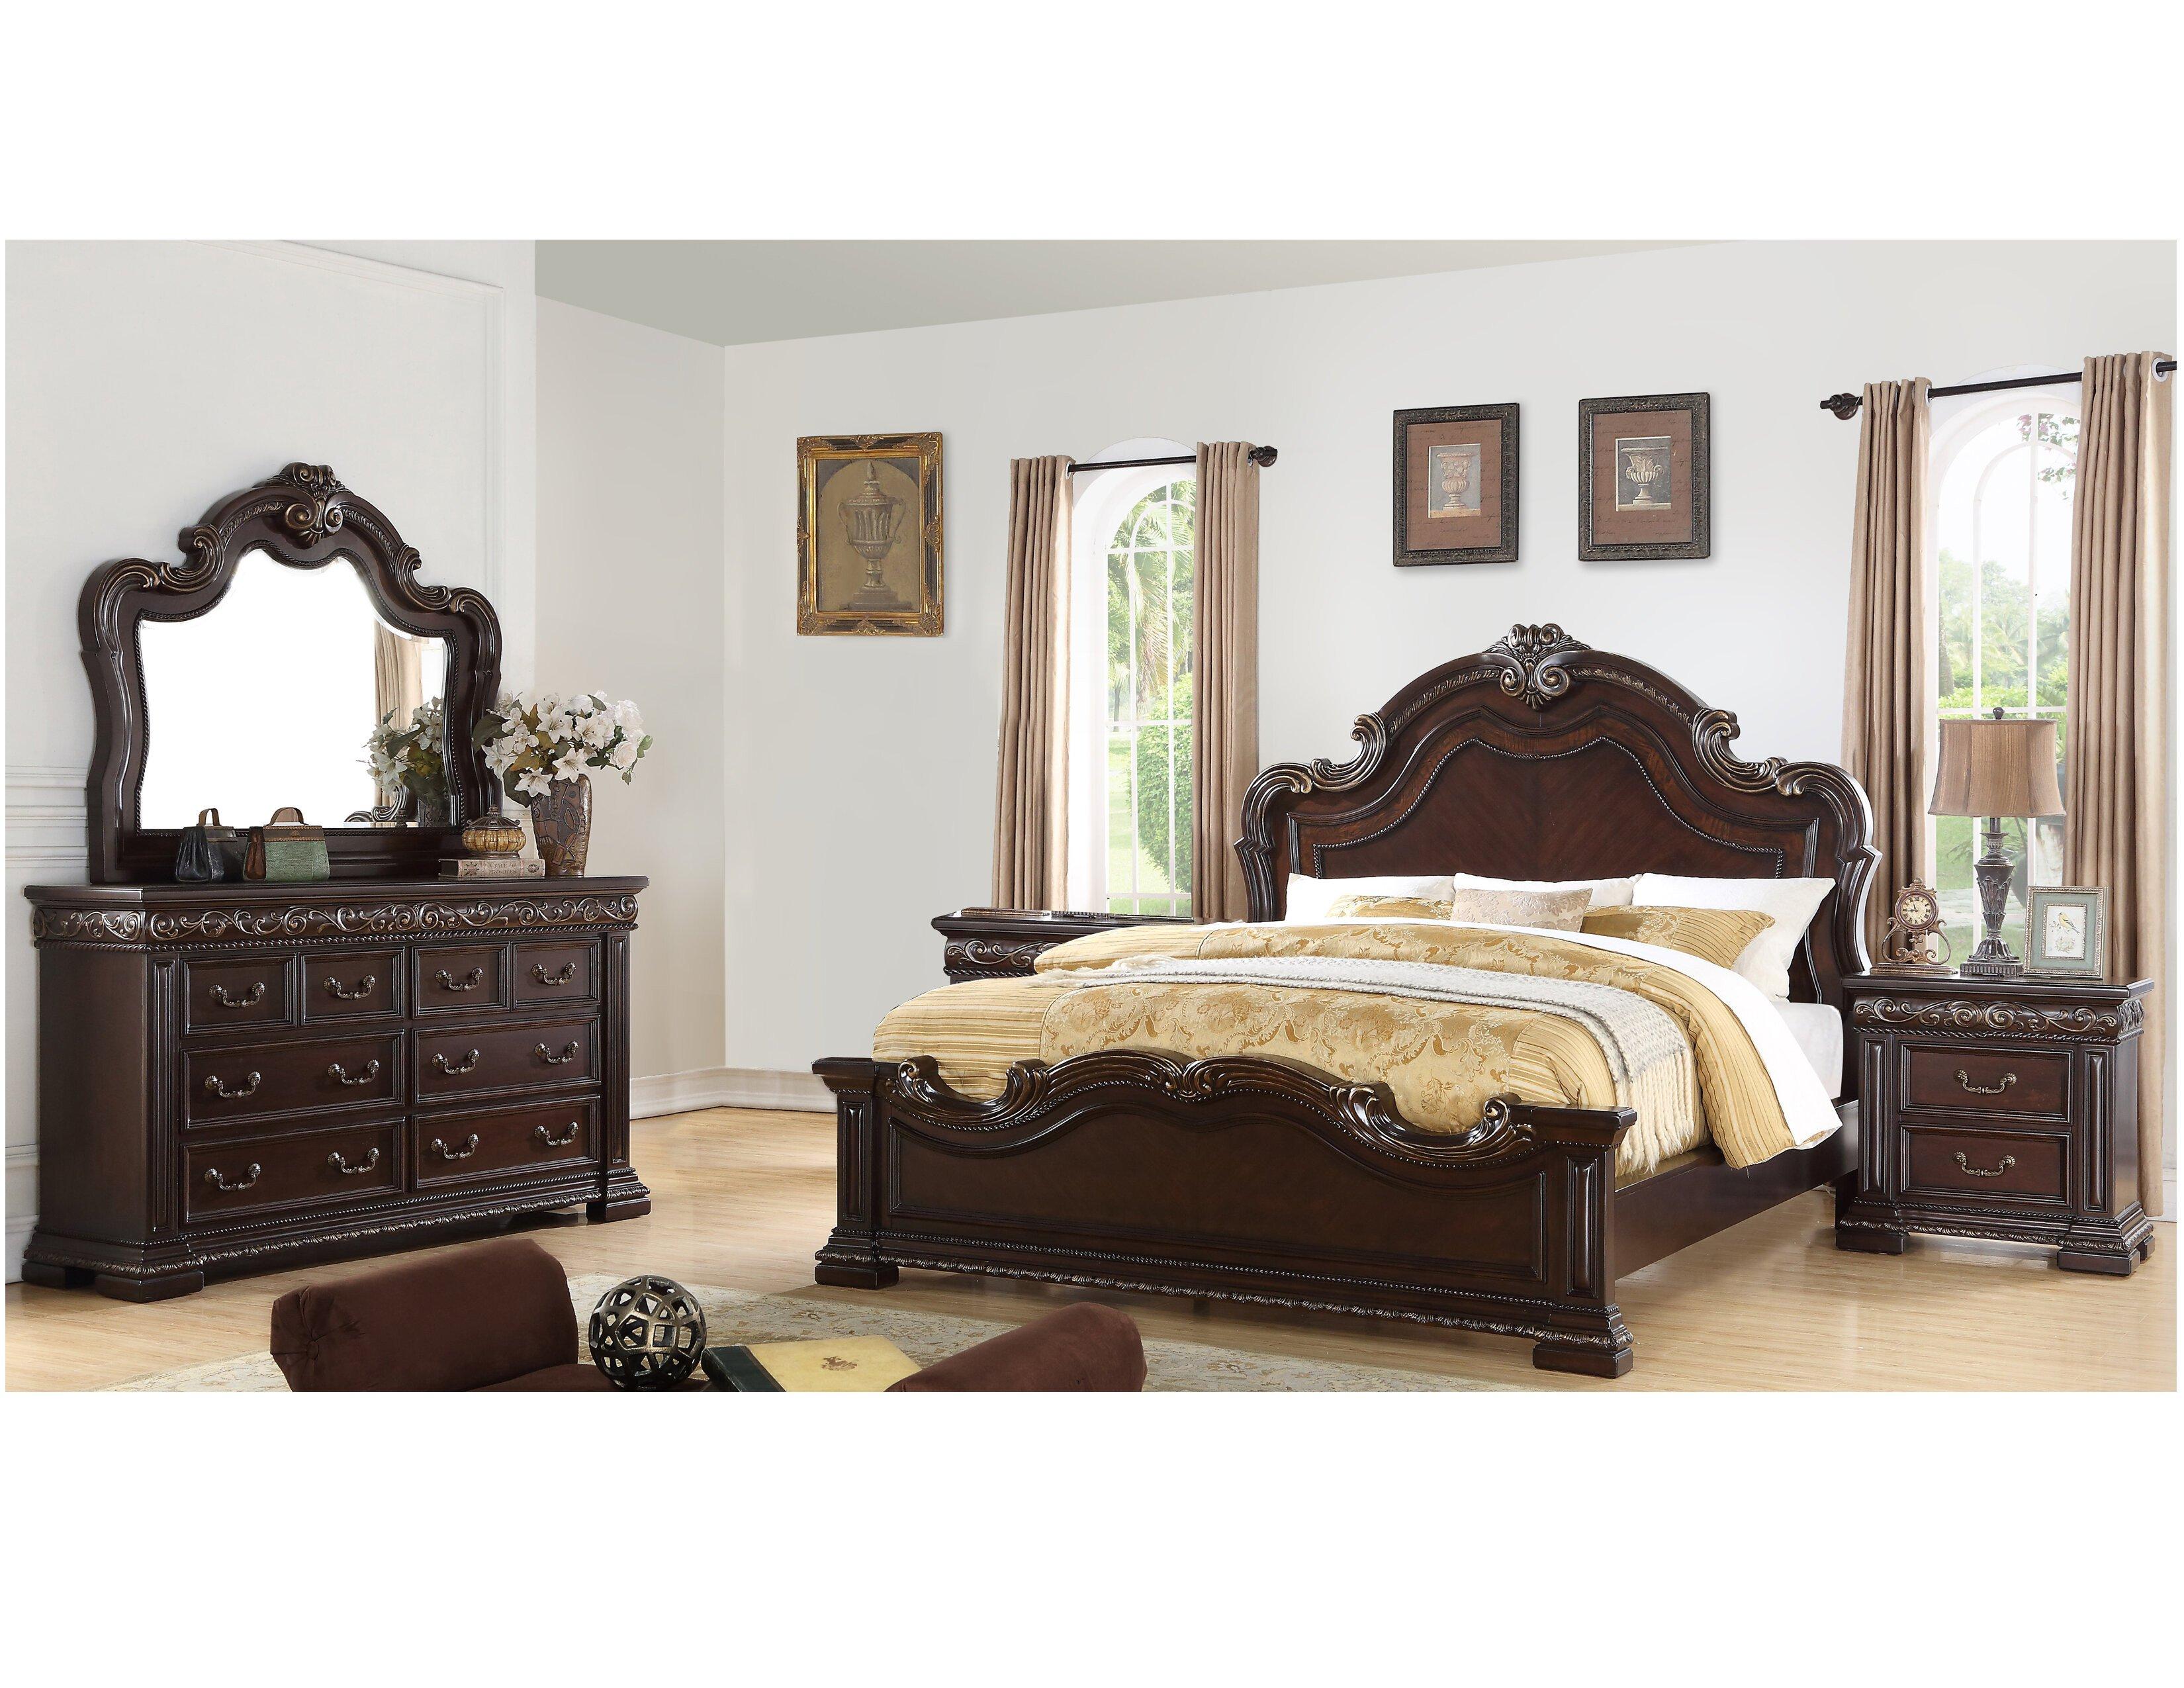 Leather Headboard Bedroom Set Luxury Bannruod Standard solid Wood 5 Piece Bedroom Set